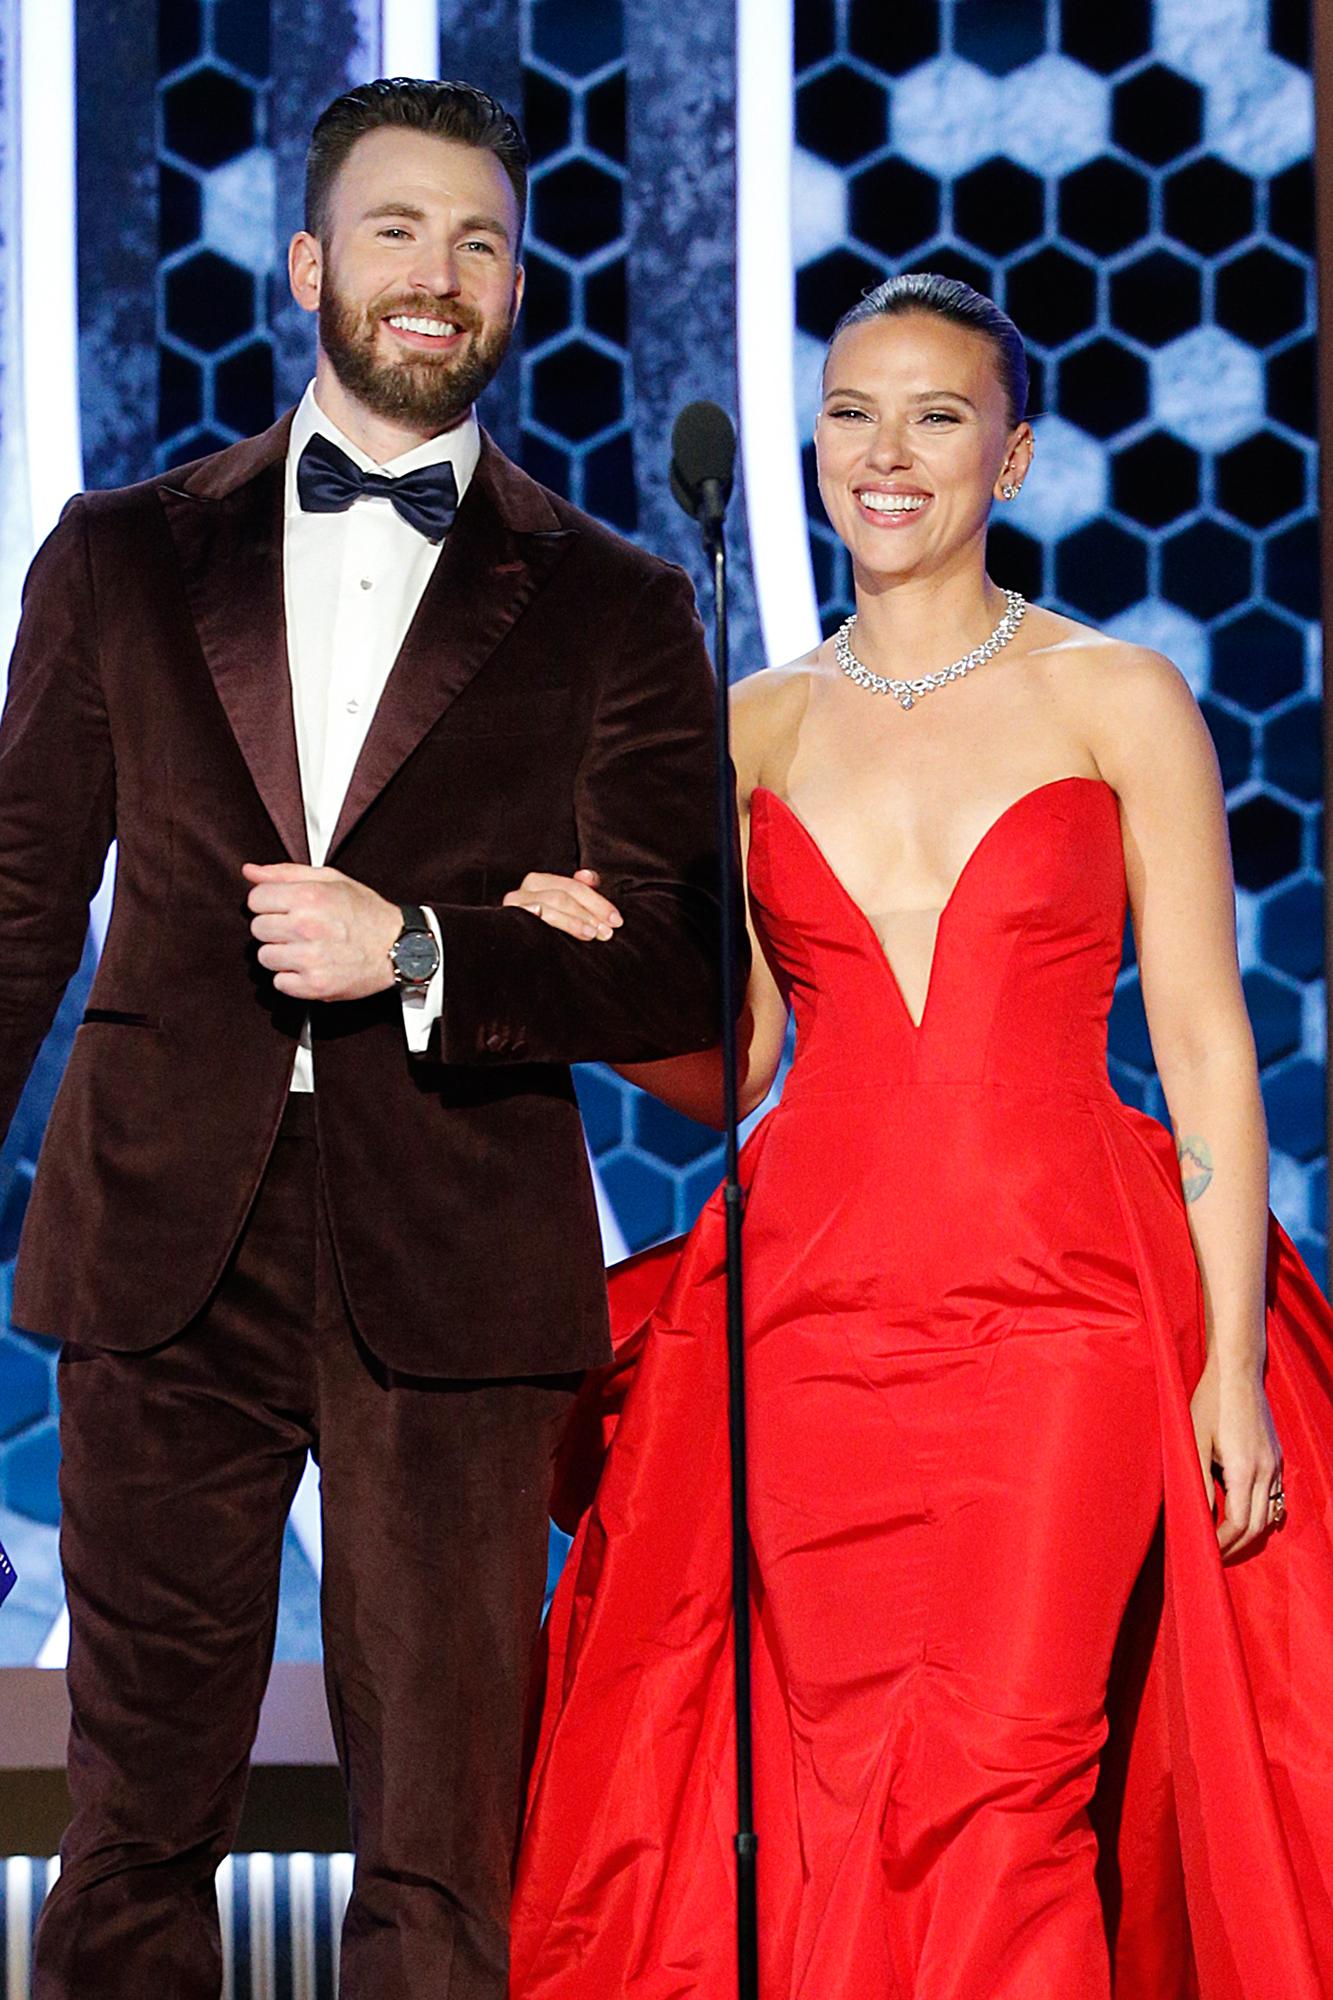 Golden Globes 2020 Chris Evans Helps Scarlett Johansson With Dress